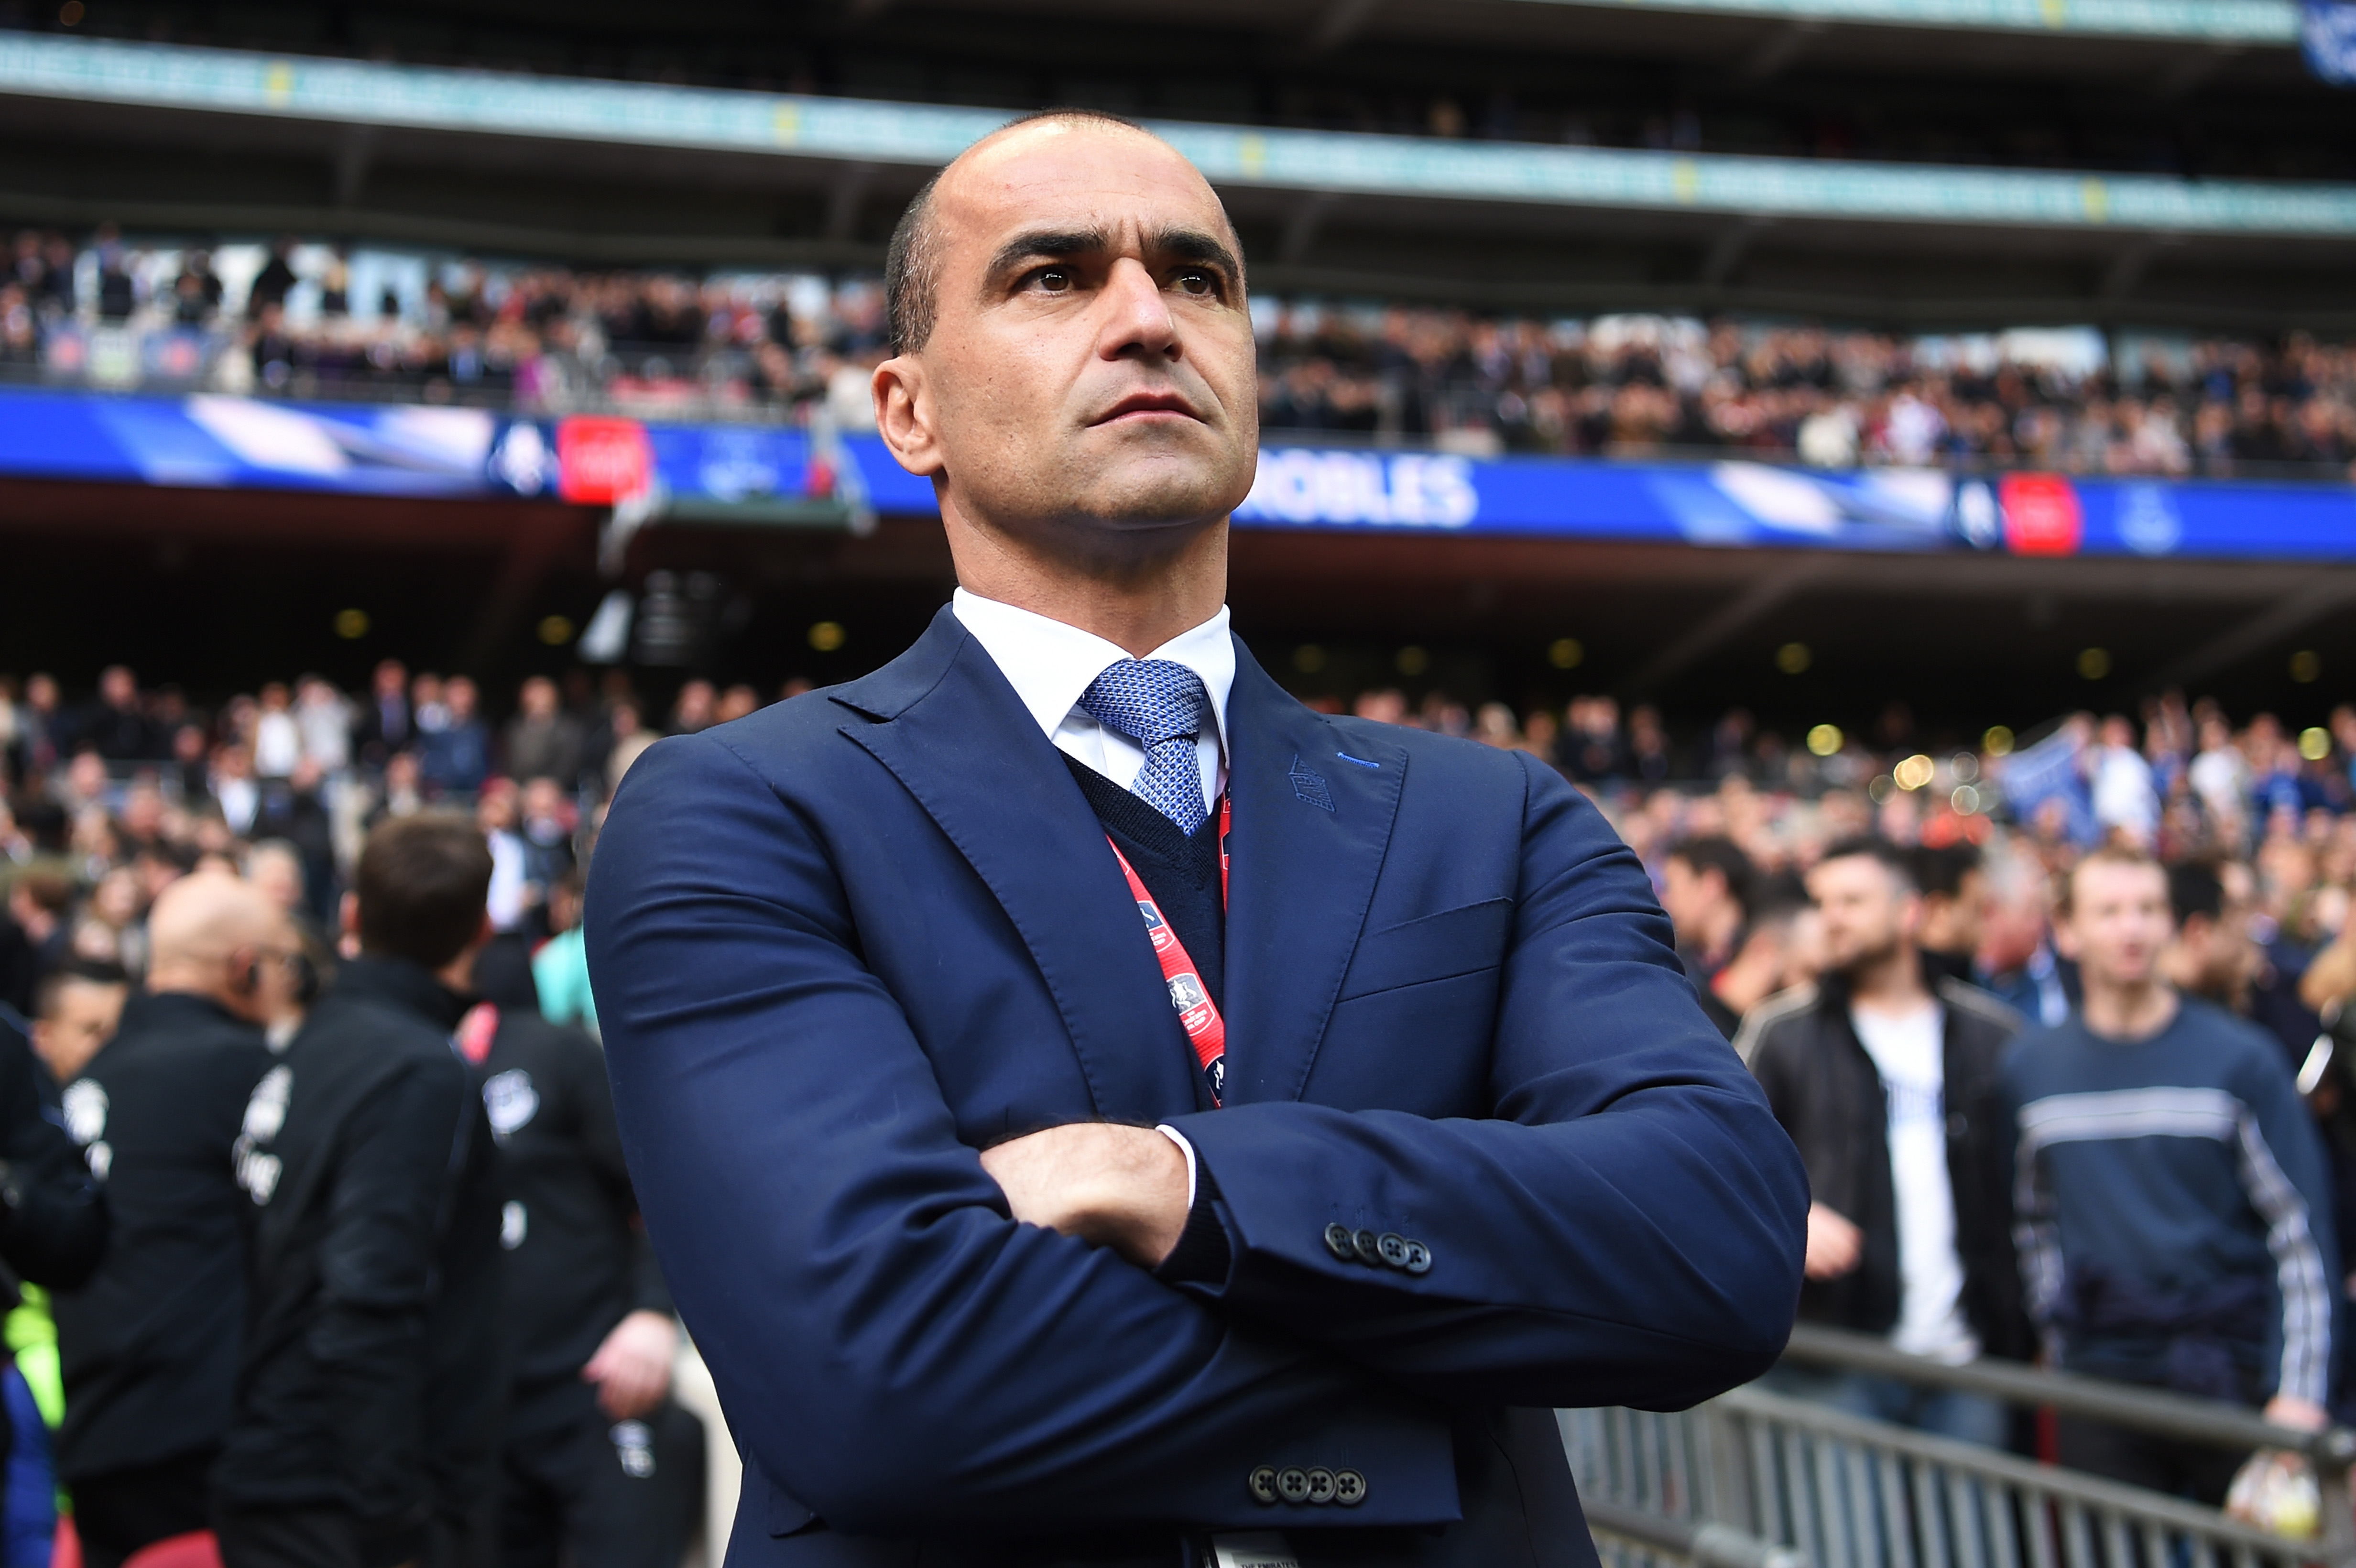 Belgium announce former Everton manager Roberto Martinez as new boss